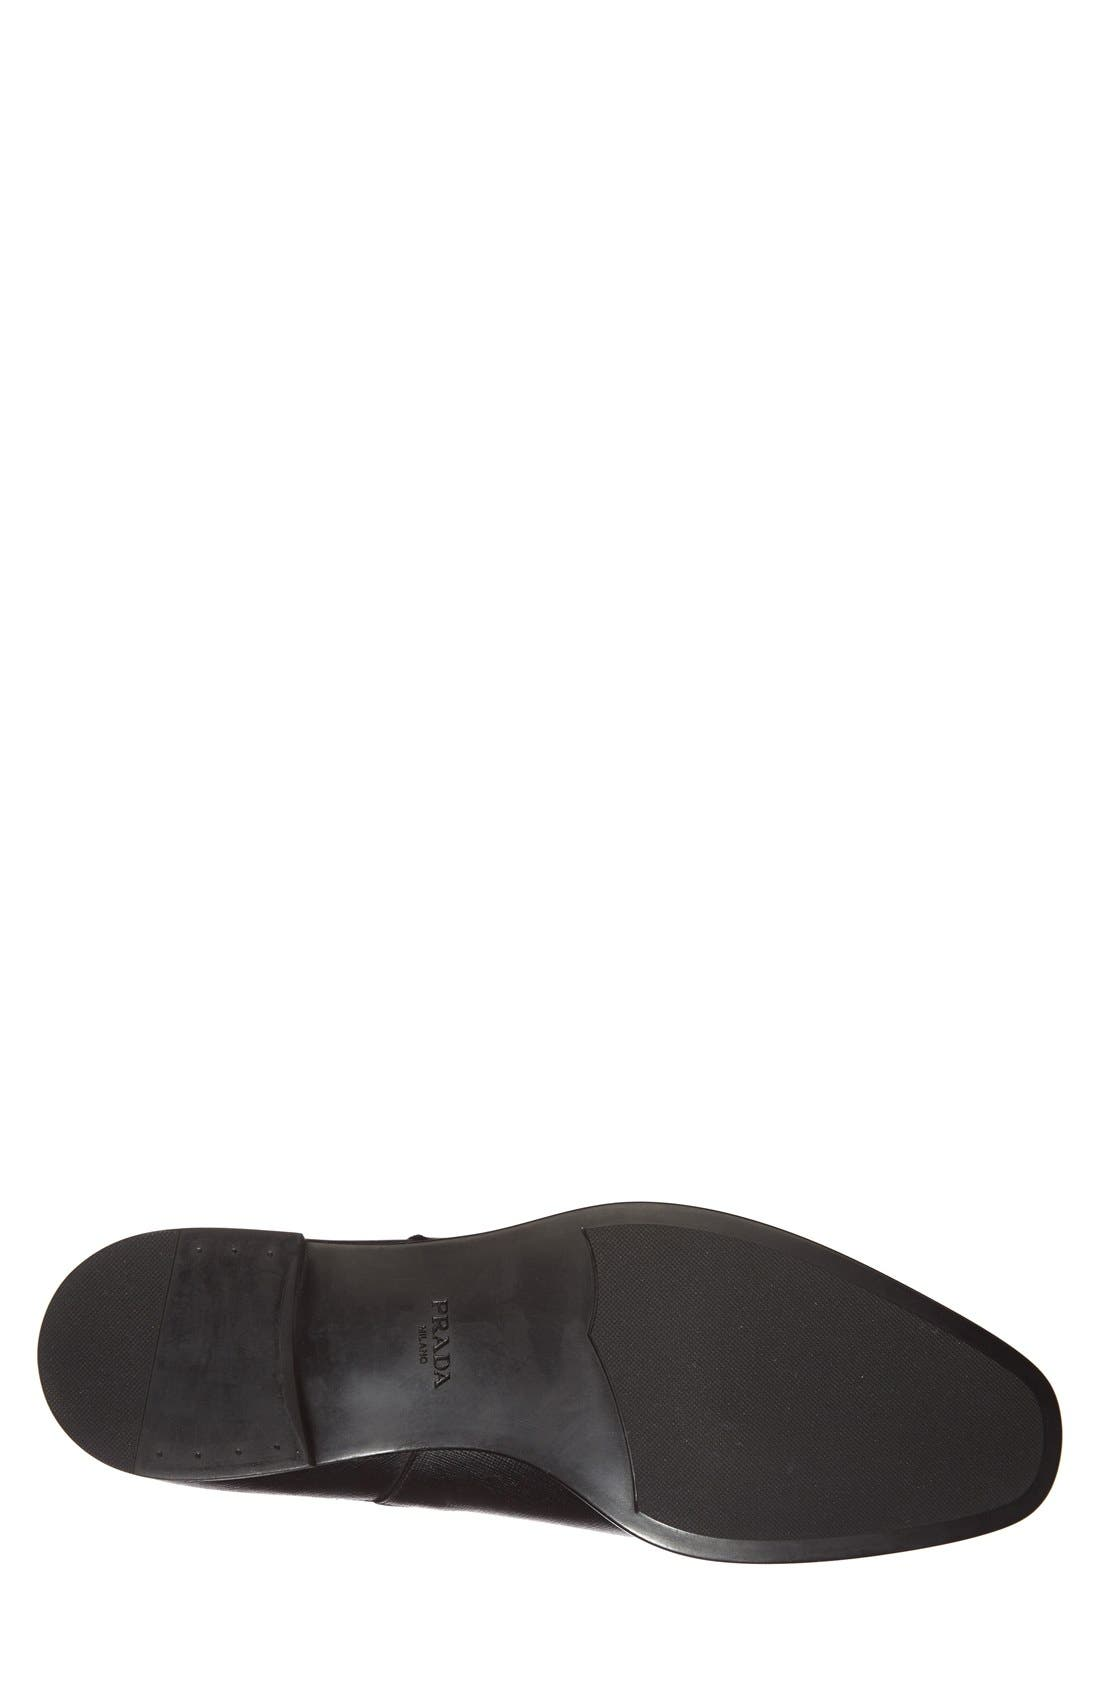 PRADA, Saffiano Leather Chelsea Boot, Alternate thumbnail 4, color, BLACK